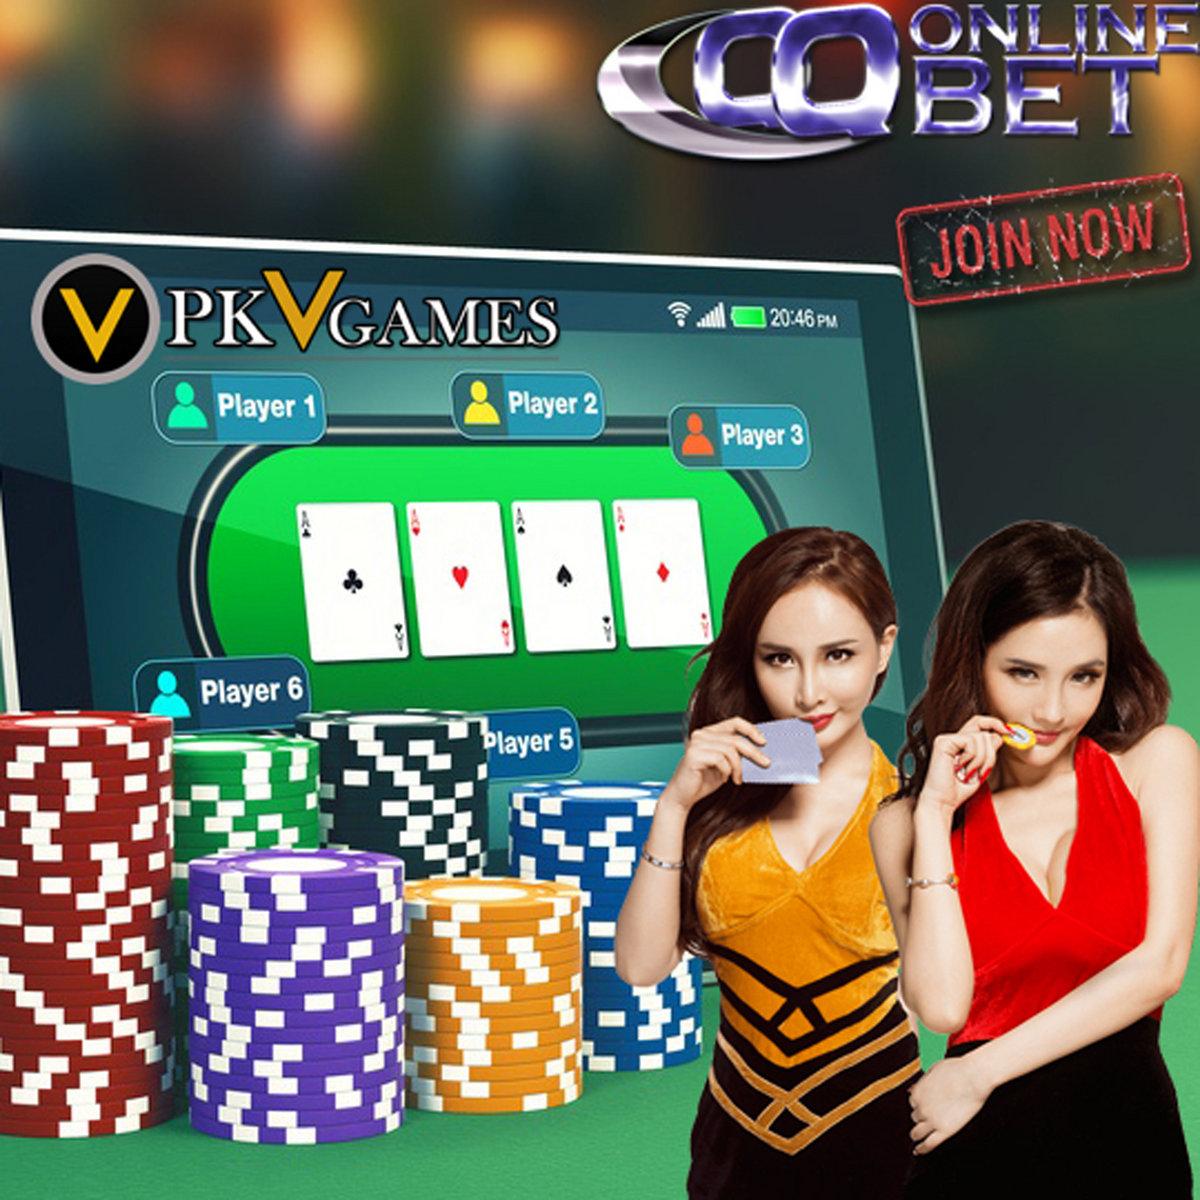 Situs Daftar Poker Online Terpercaya Situs Daftar Poker Online Terpercaya Linglingmeikarta